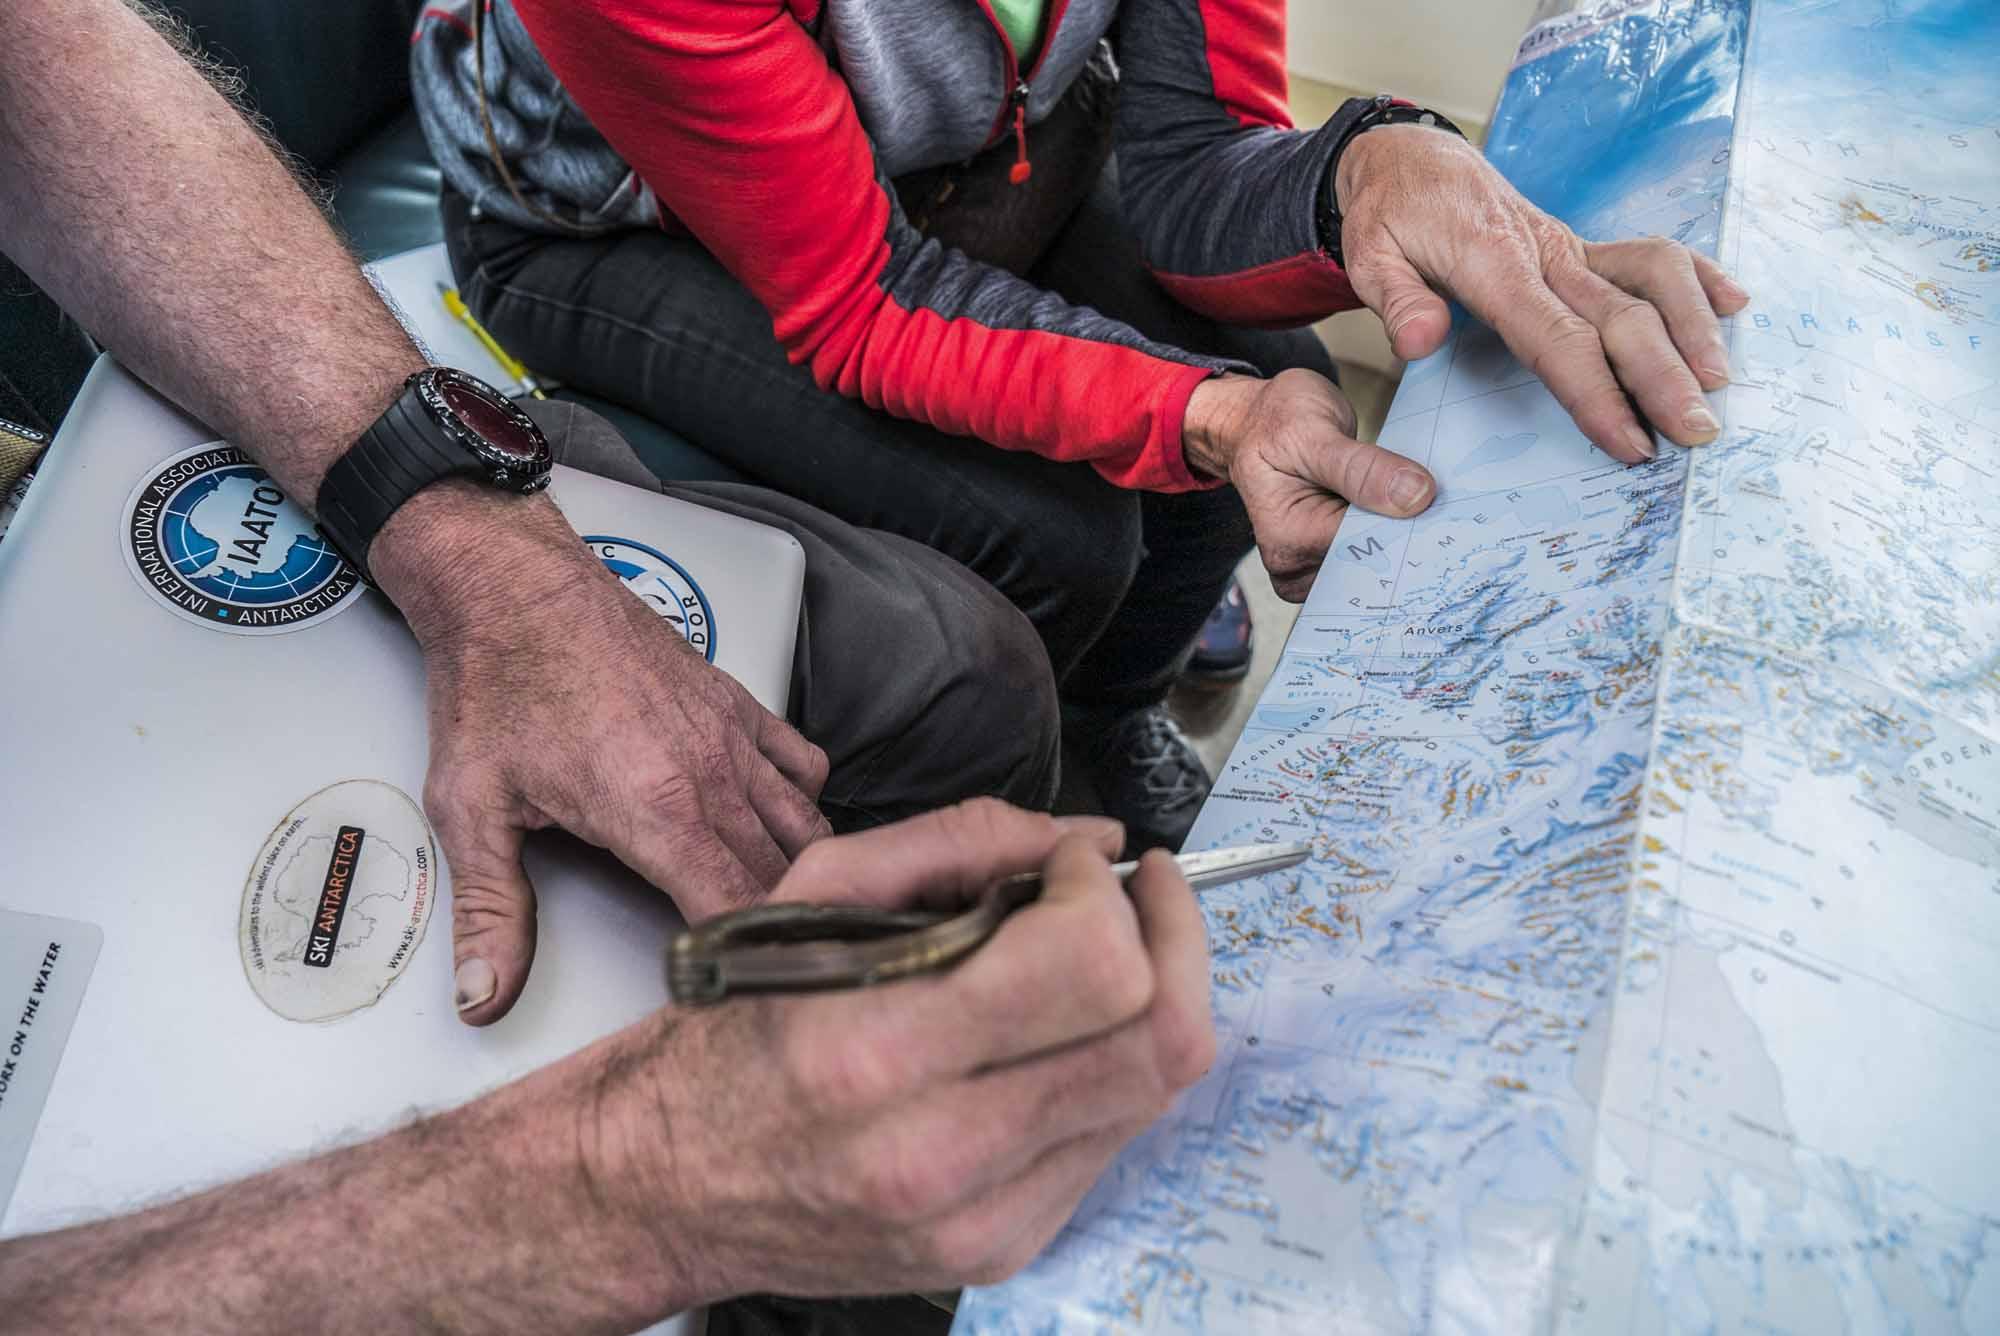 Polar-Quest-Exploration-Polaire-Exploring-Boundaries-in-Antarctica-Caroline-Cote-photo-map-hands